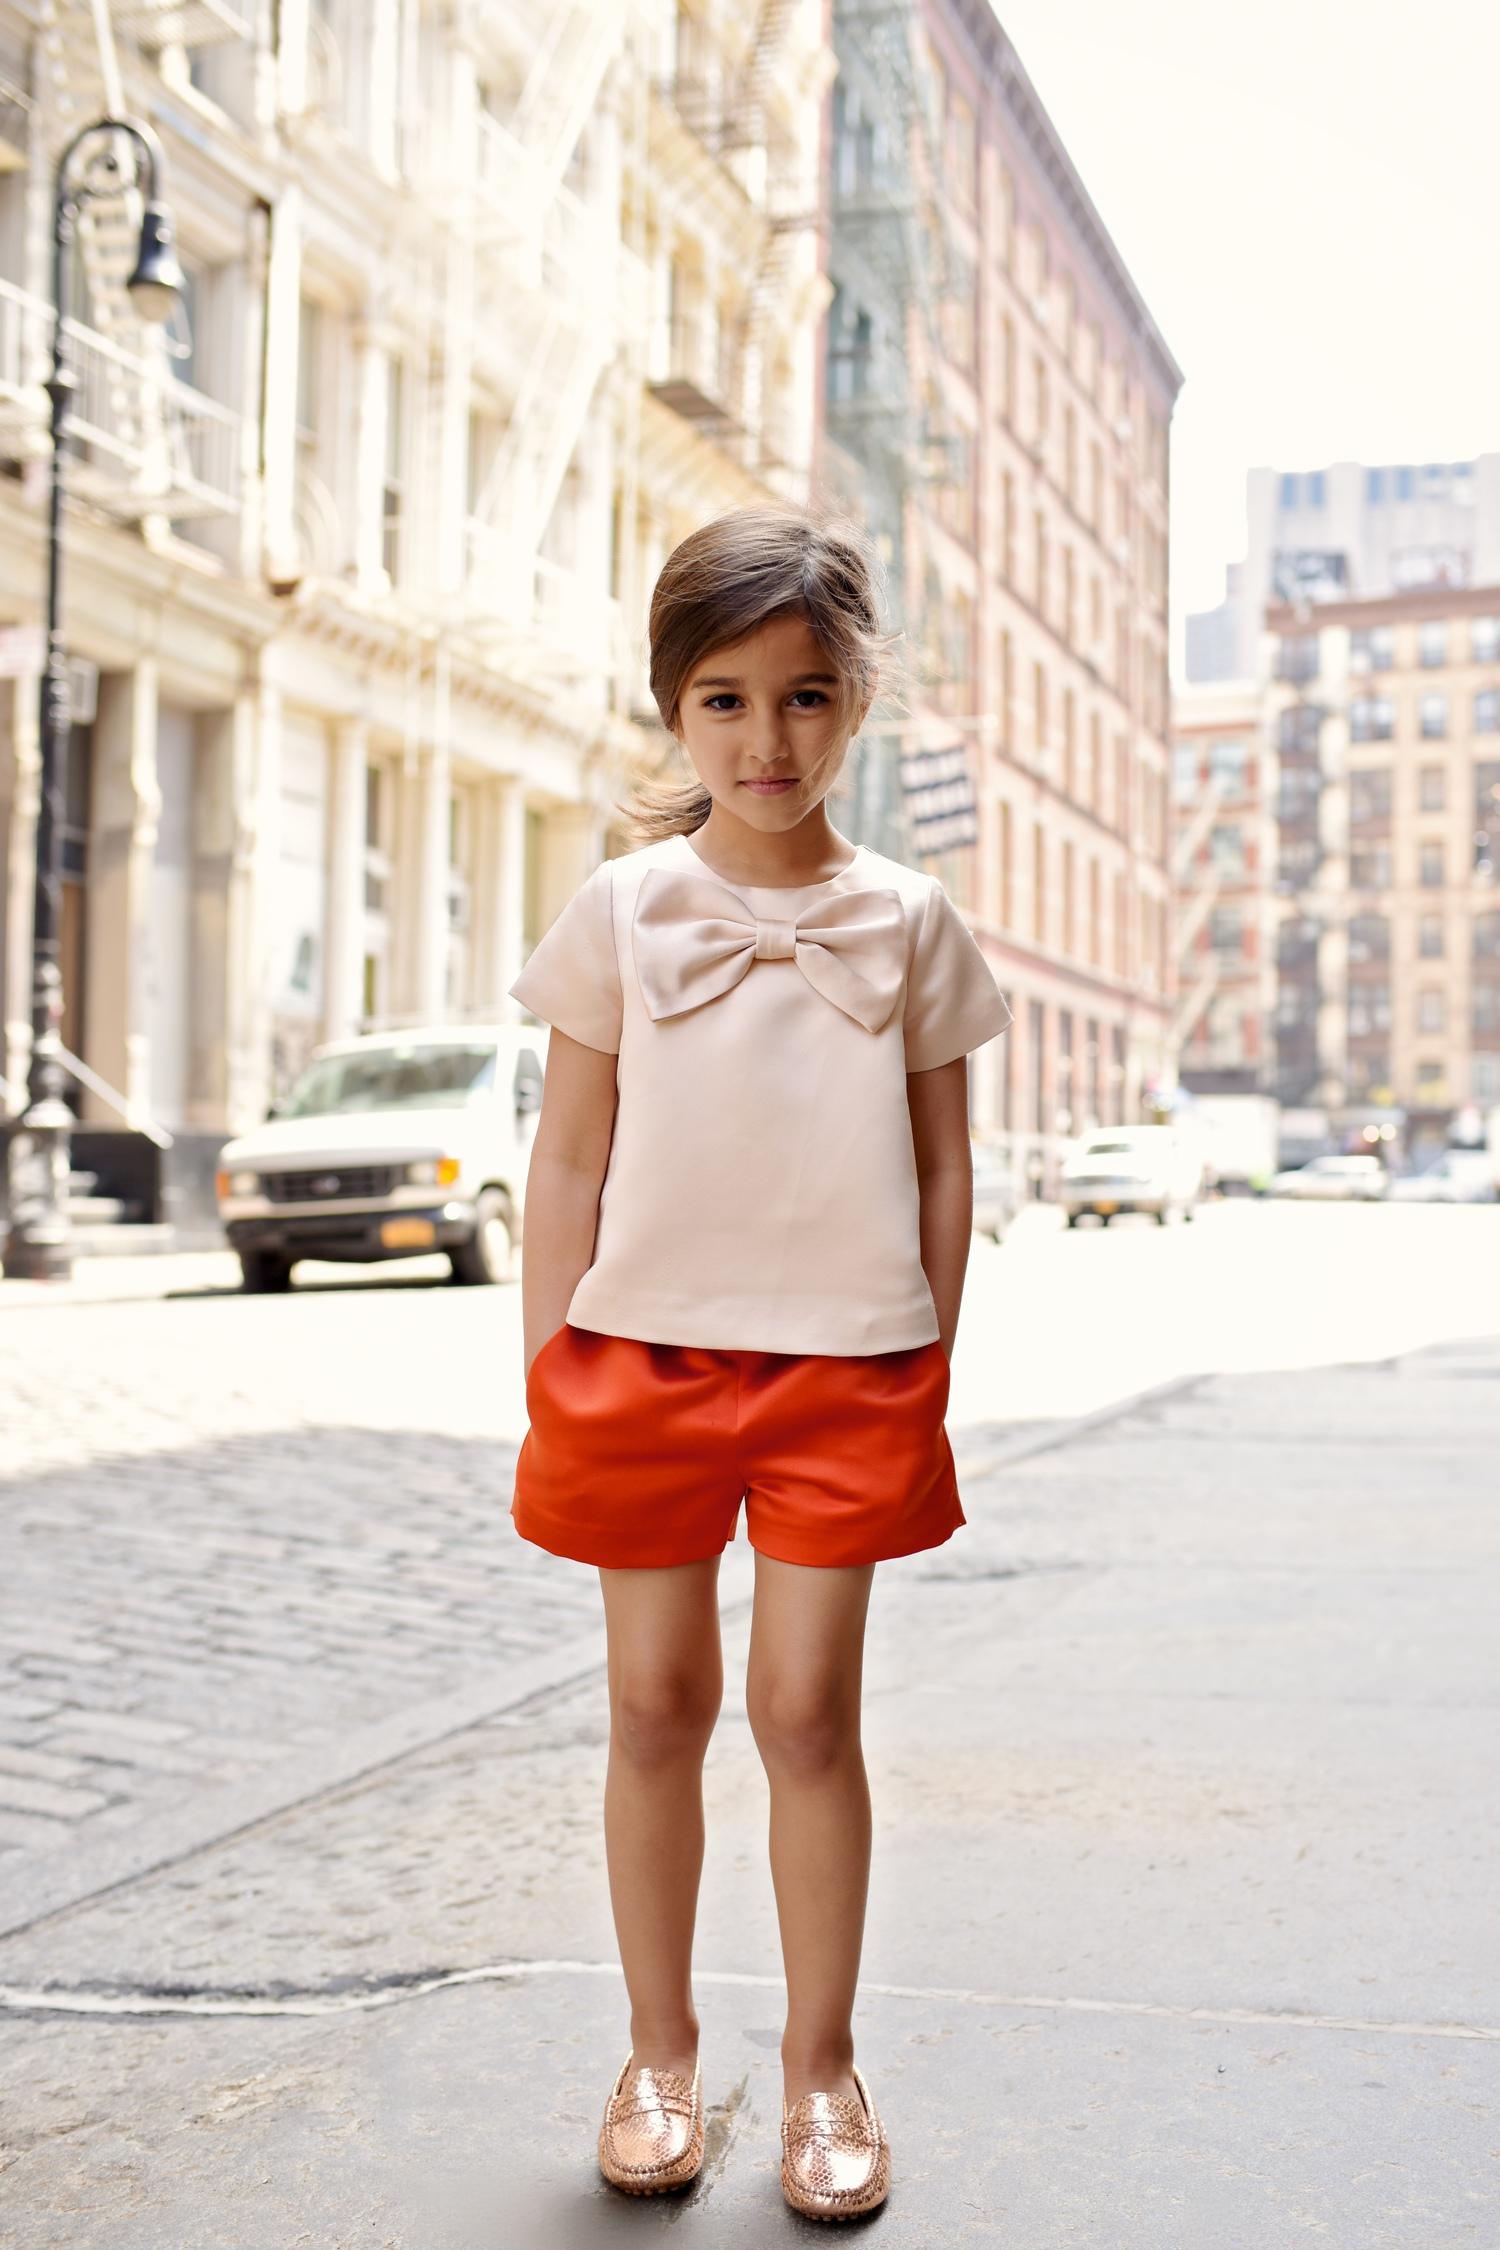 Enfant+Street+Style+by+Gina+Kim+Photography+Hucklebones-5.jpeg